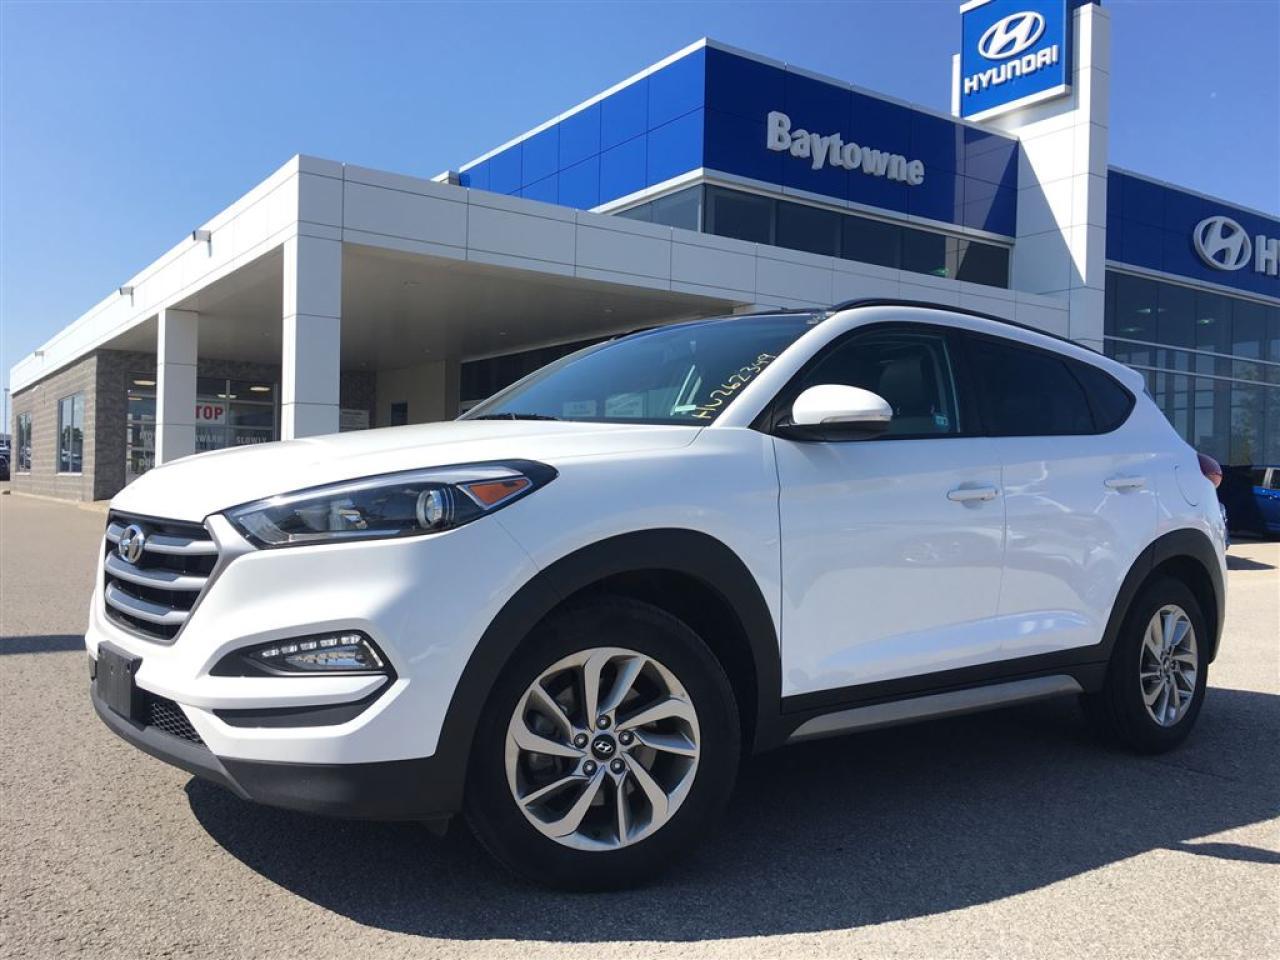 2017 Hyundai Tucson AWD 2.0L SE Previous Daily Rental